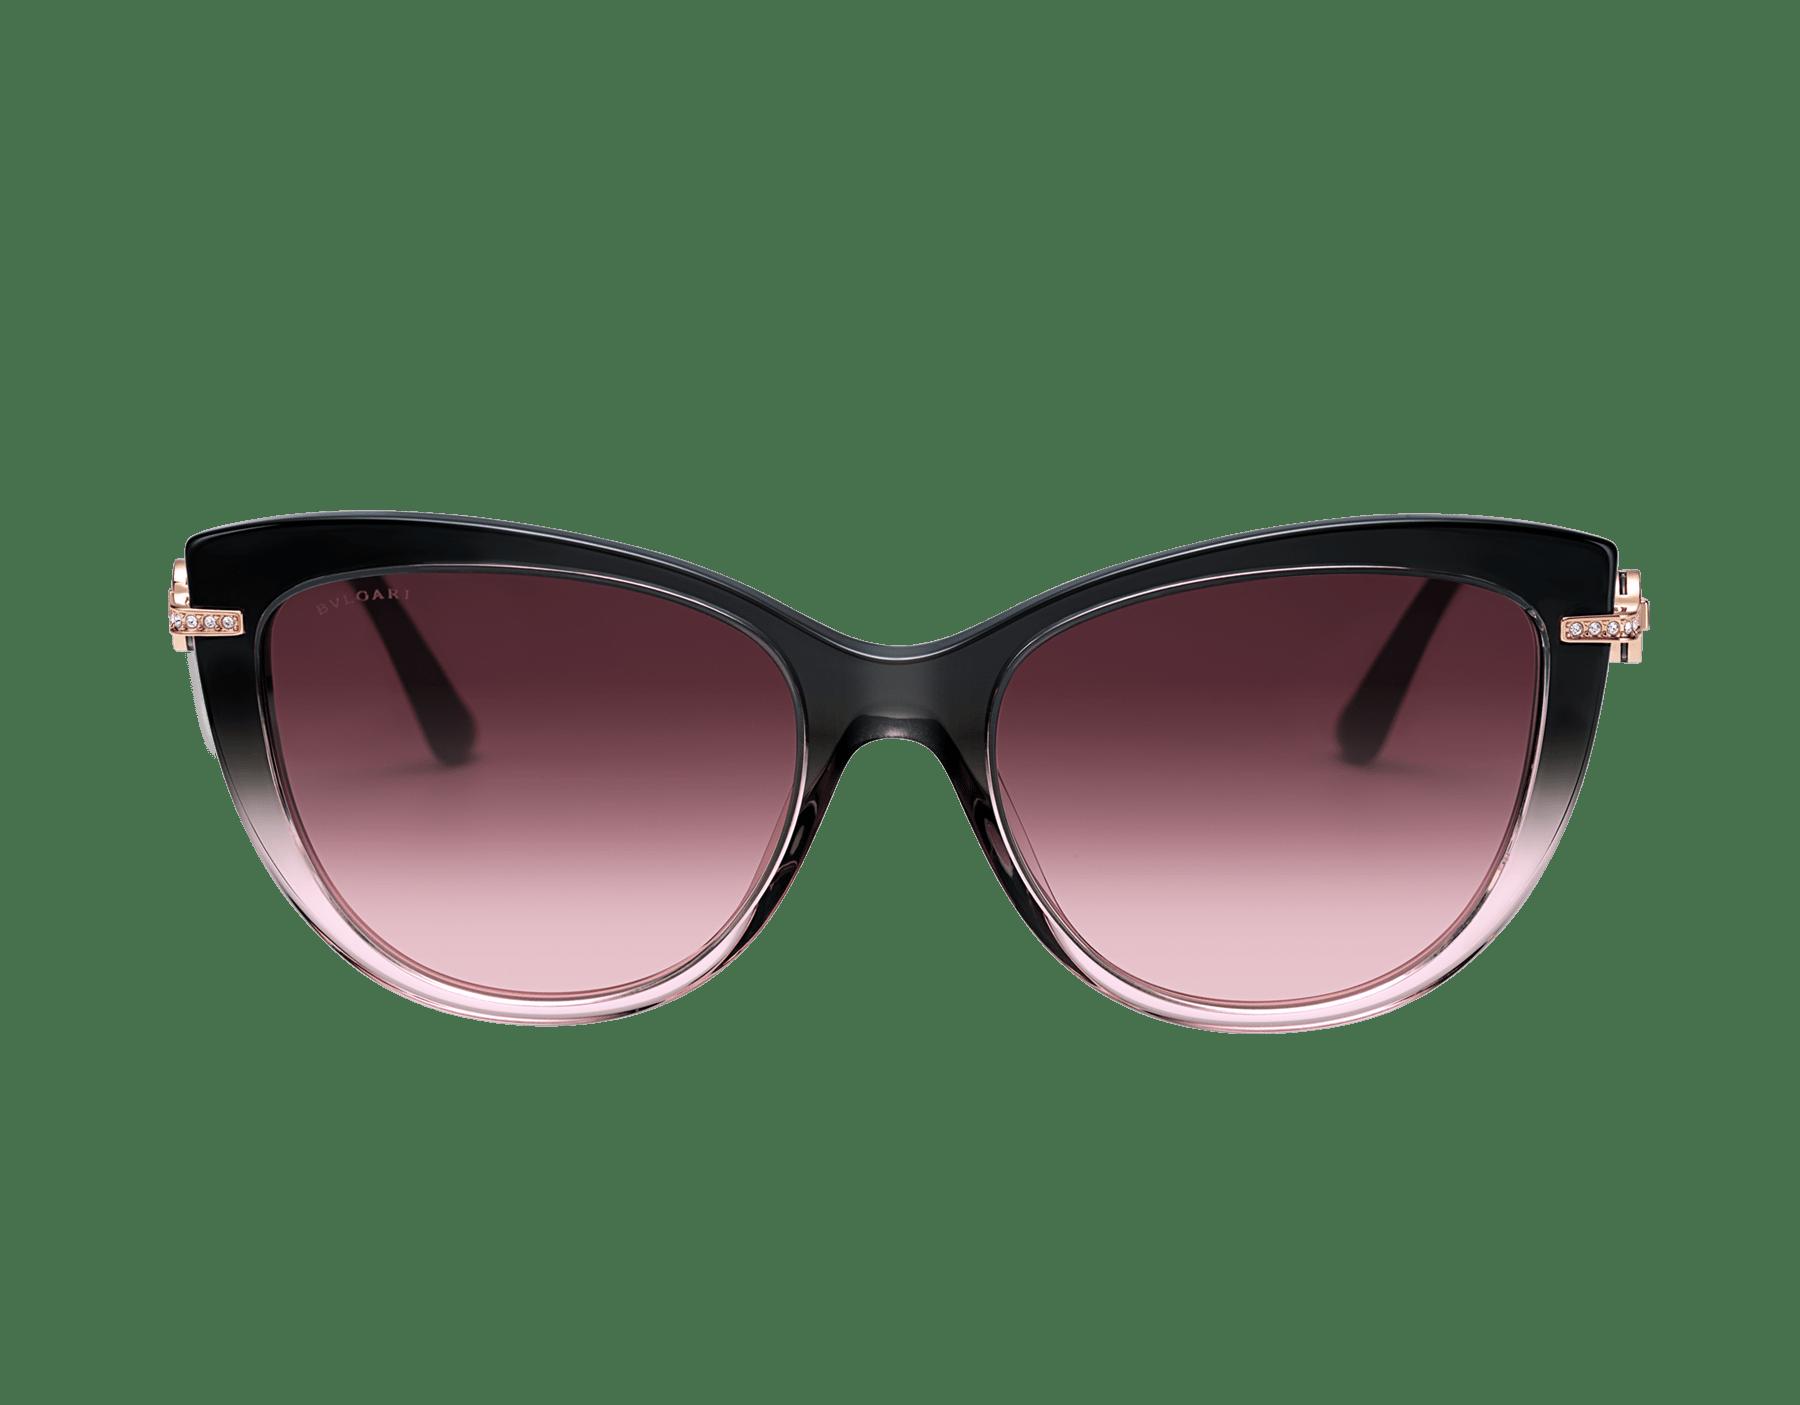 BVLGARI BVLGARI cat-eye acetate sunglasses with metal décor and crystals. 903802 image 2